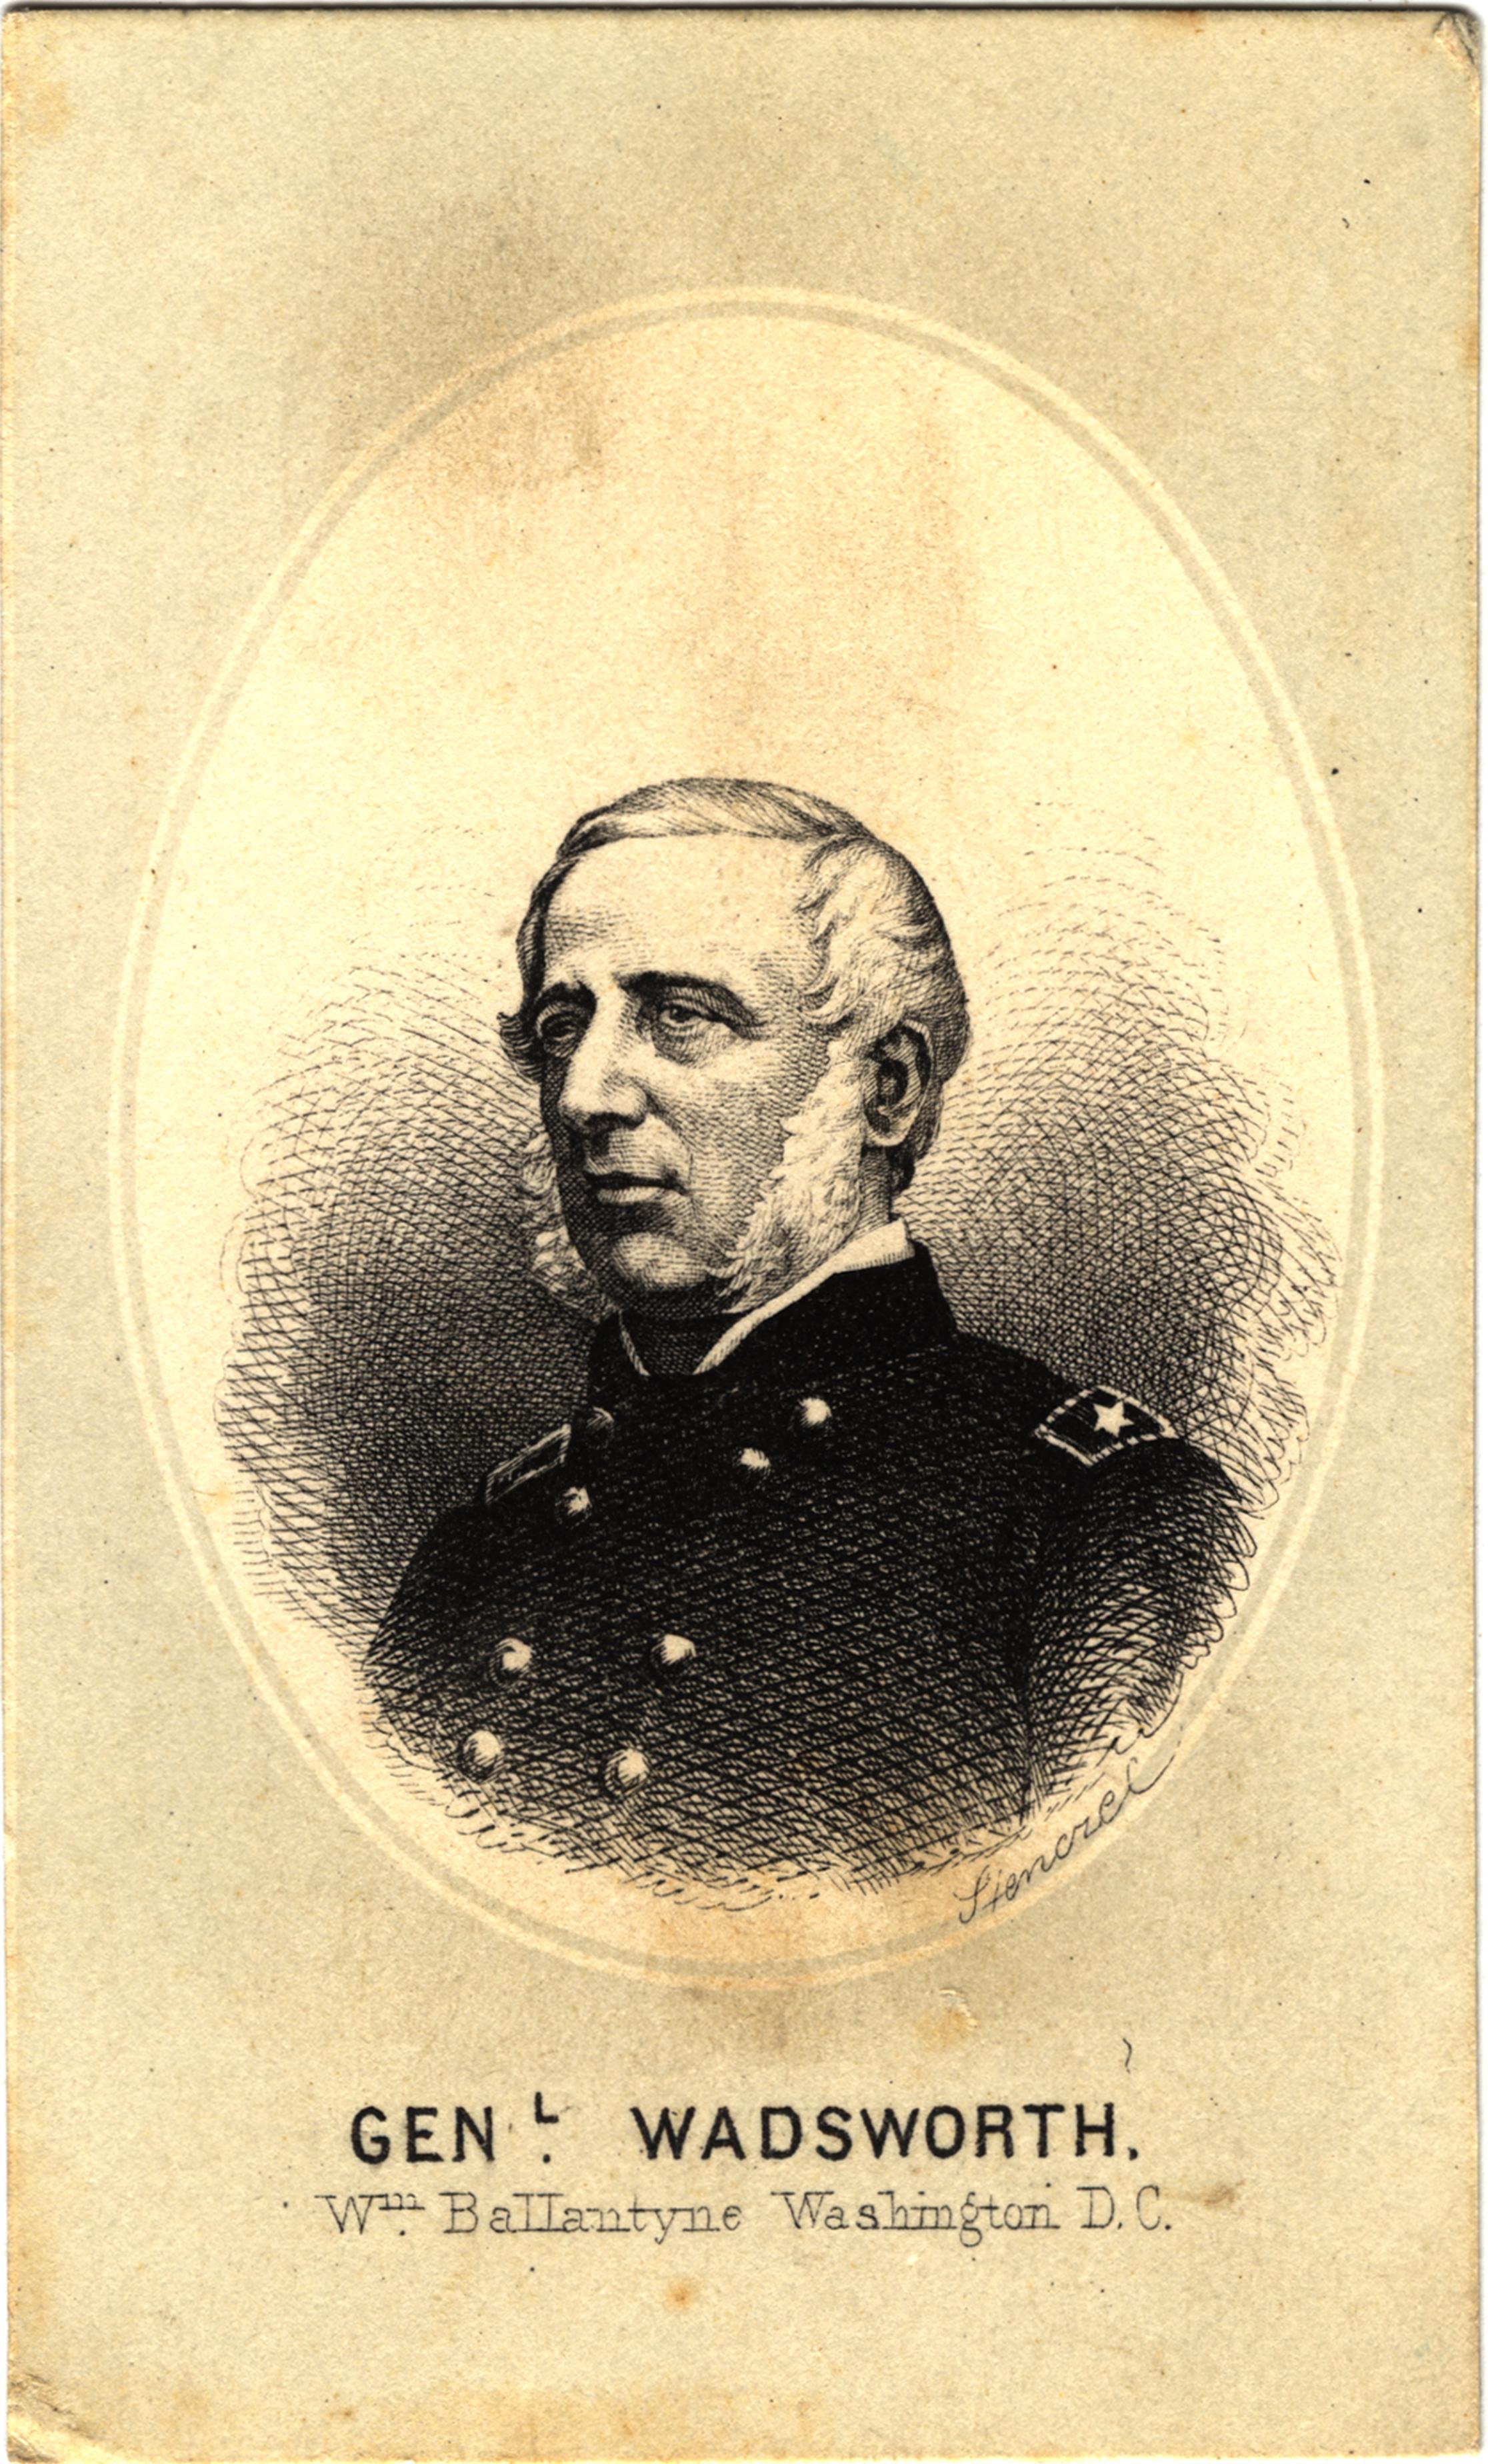 James S. Wadsworth, circa 1860s